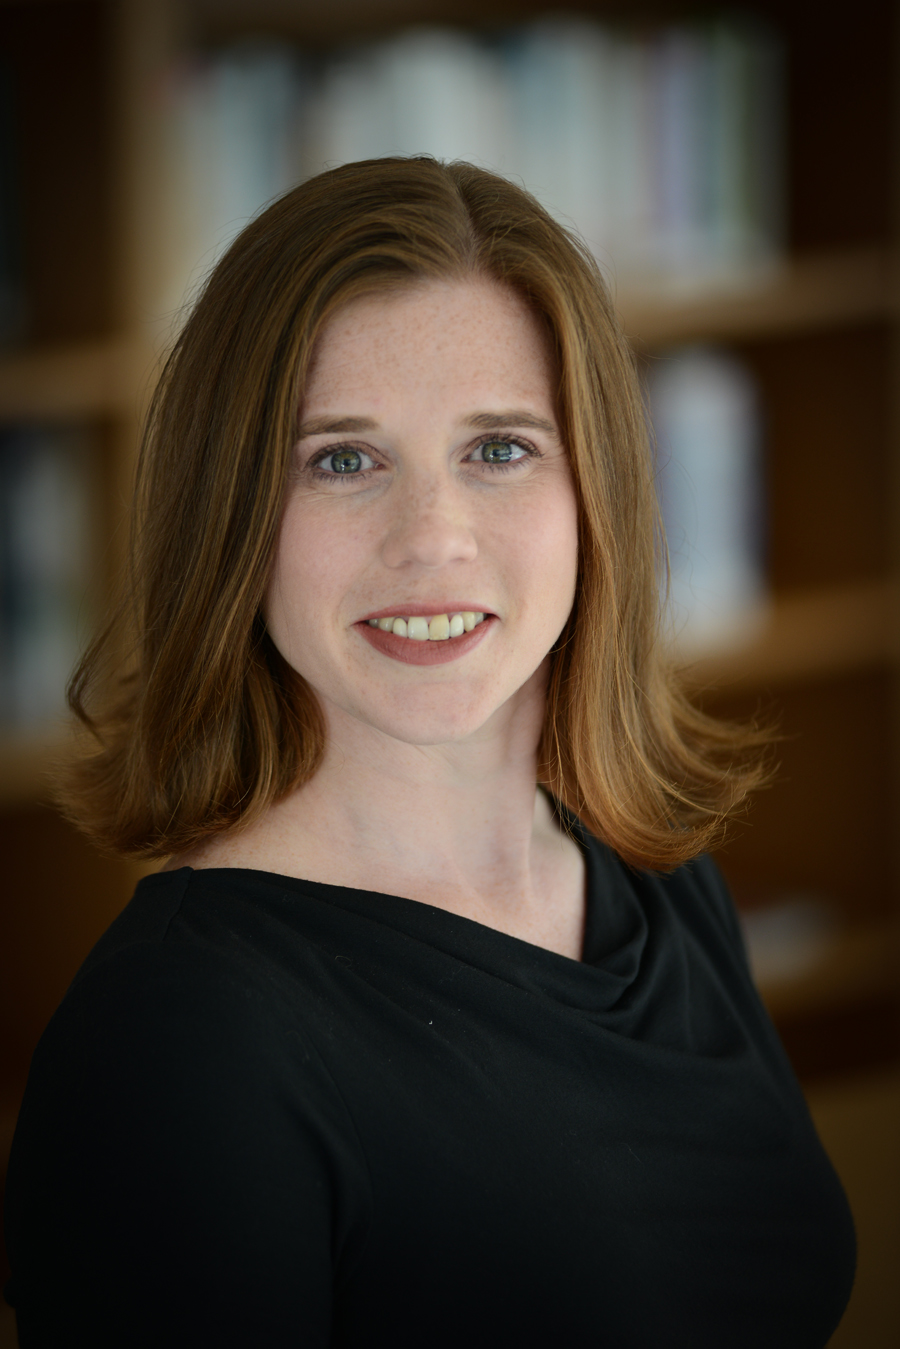 Molly Flanagan